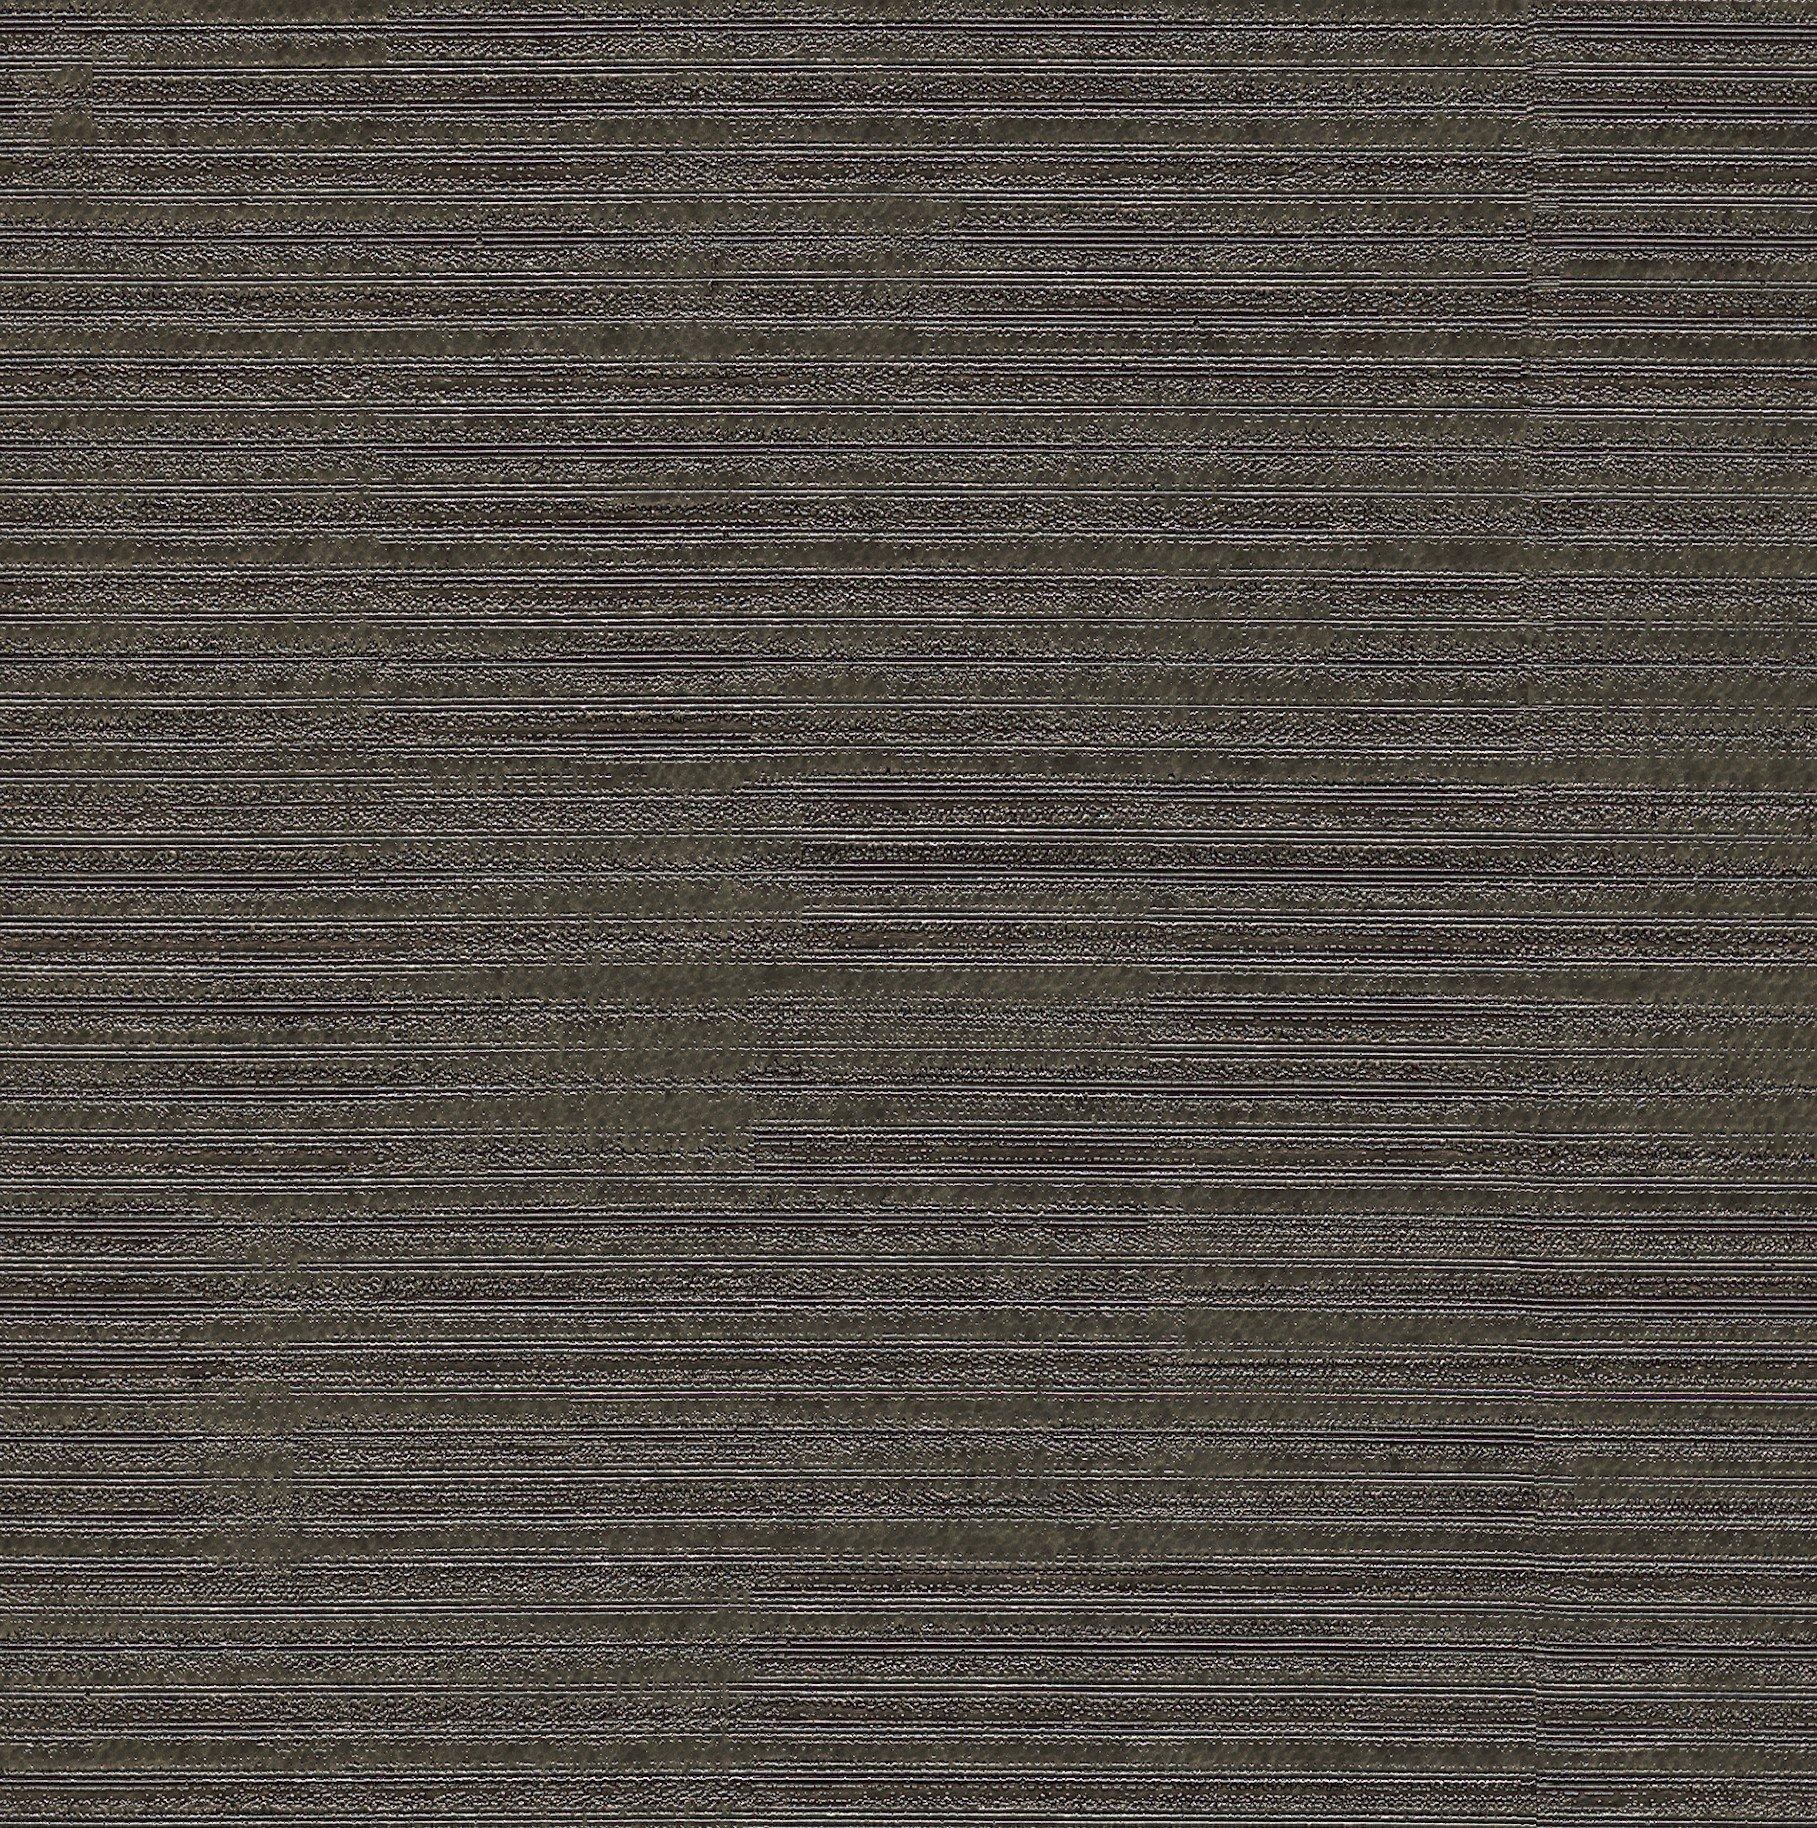 Warner WD3093 Cincinatti Mauve Reflective Metallic Stripes Wallpaper, Bronze